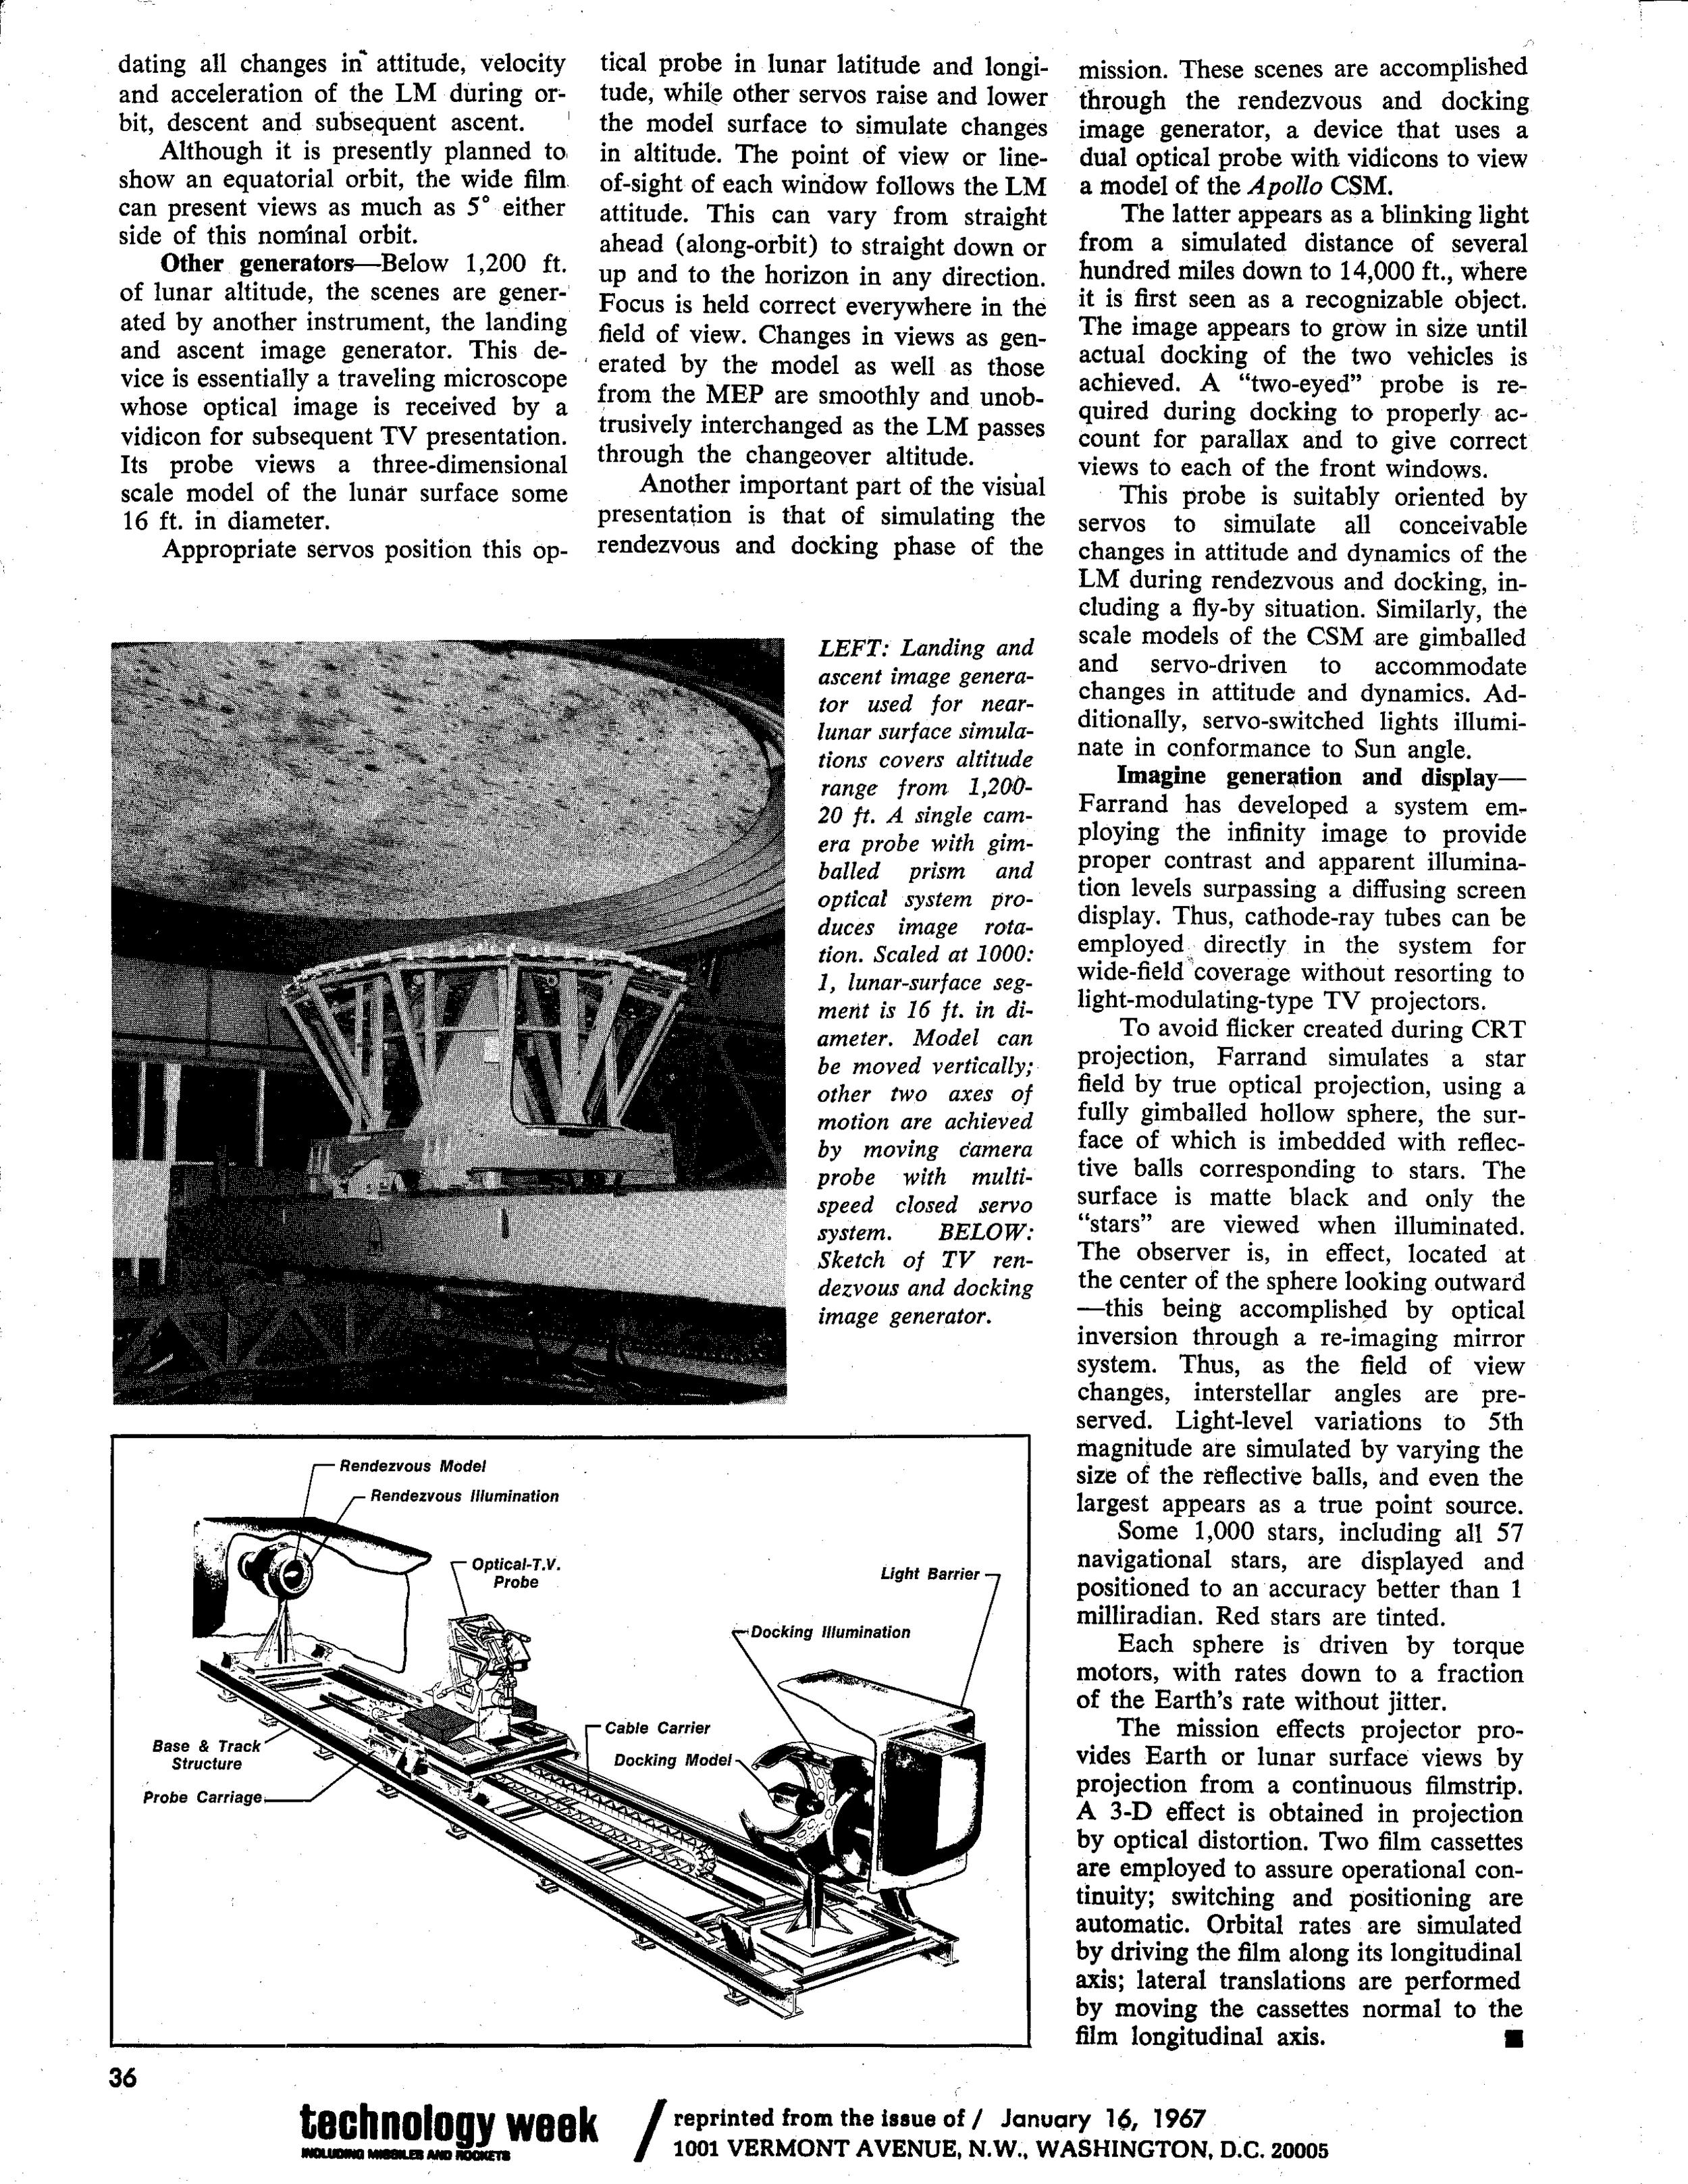 1967-01-12   Technology Week LMS Optics_Page_2.png